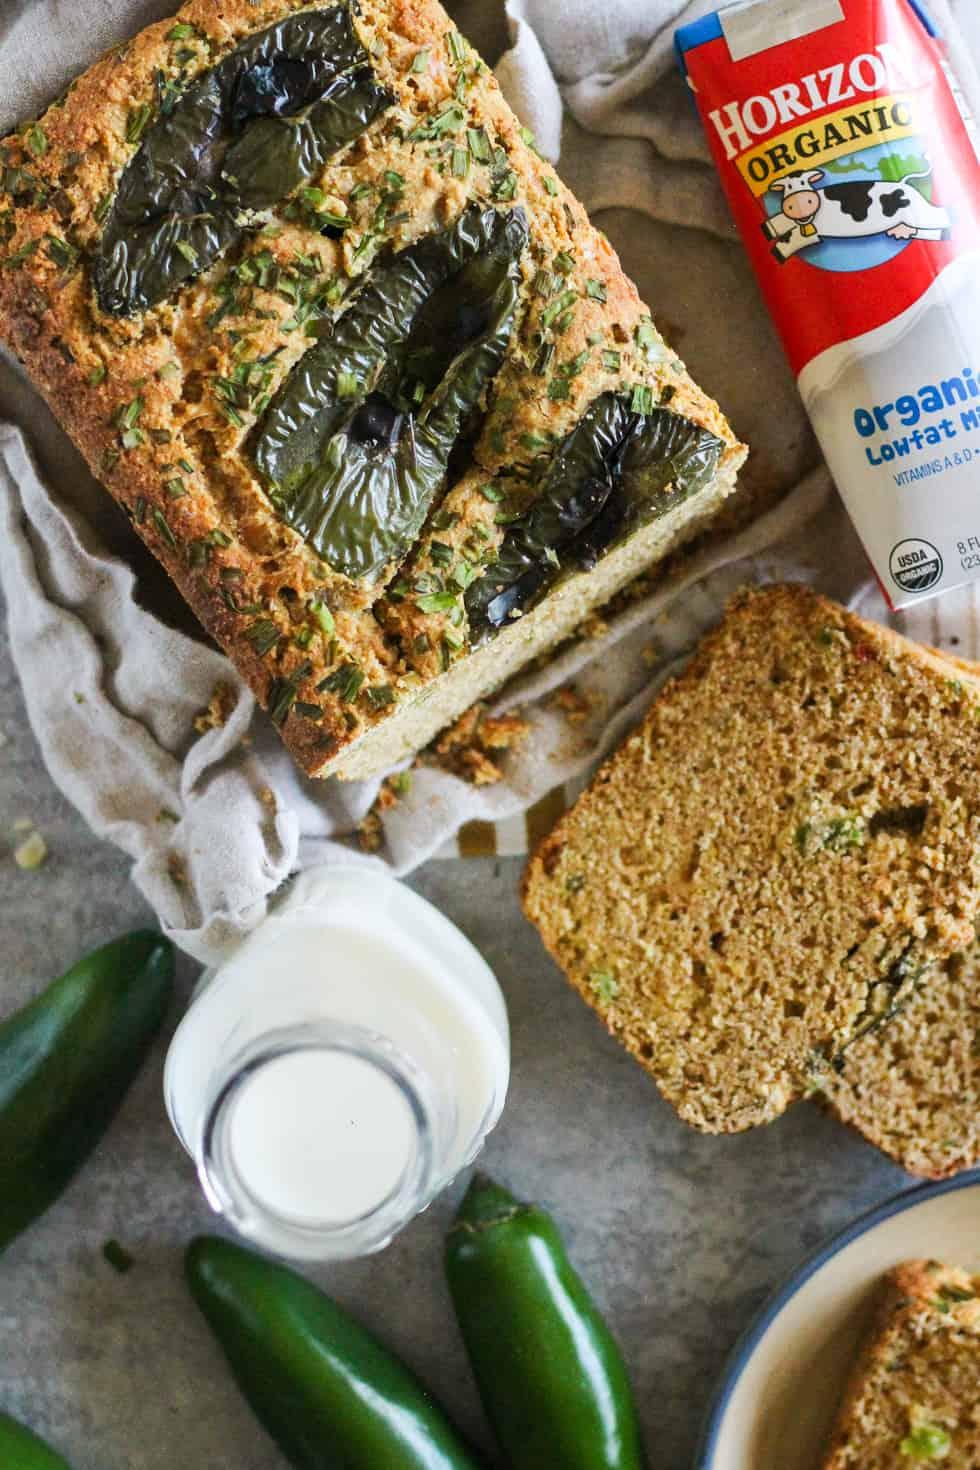 Whole Grain Cornbread Loaf with jalapeños on top. Milk jug and carton of Horizon Organic milk next ot the bread.